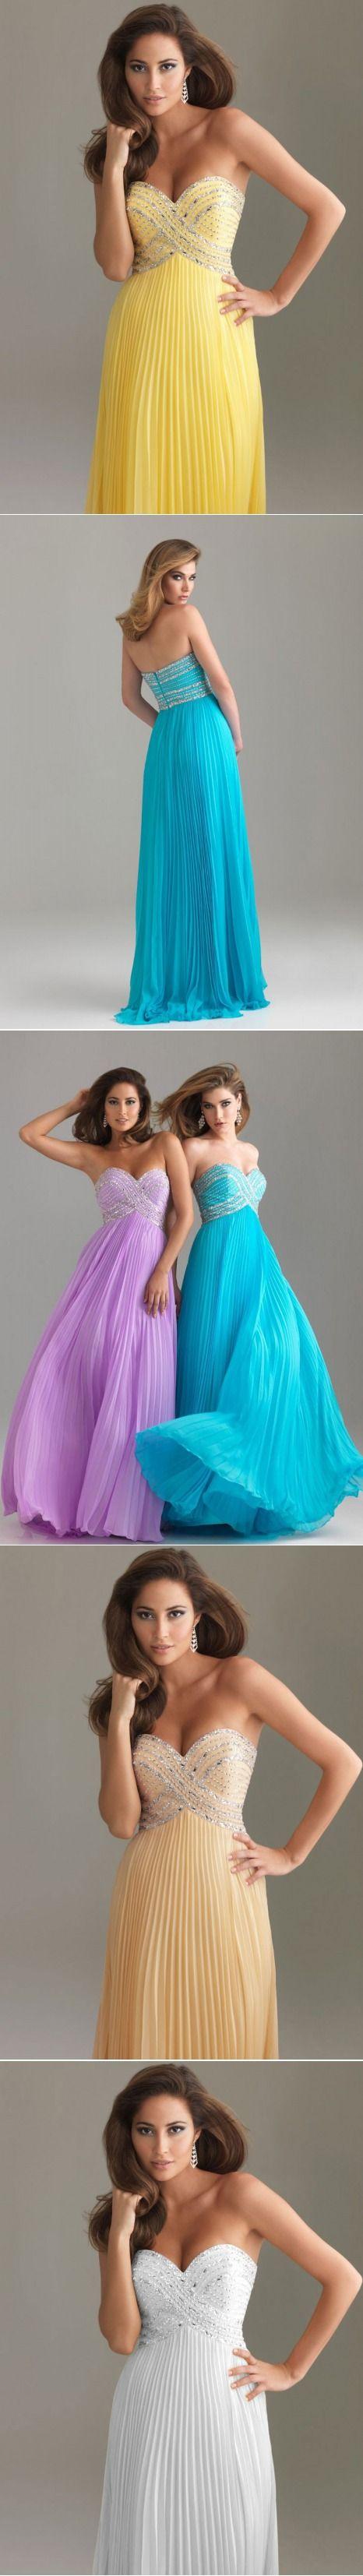 Promenade Outfit Buy Babydoll Dirndl Bodycon Weddings Gowns Informal Pinstripe…